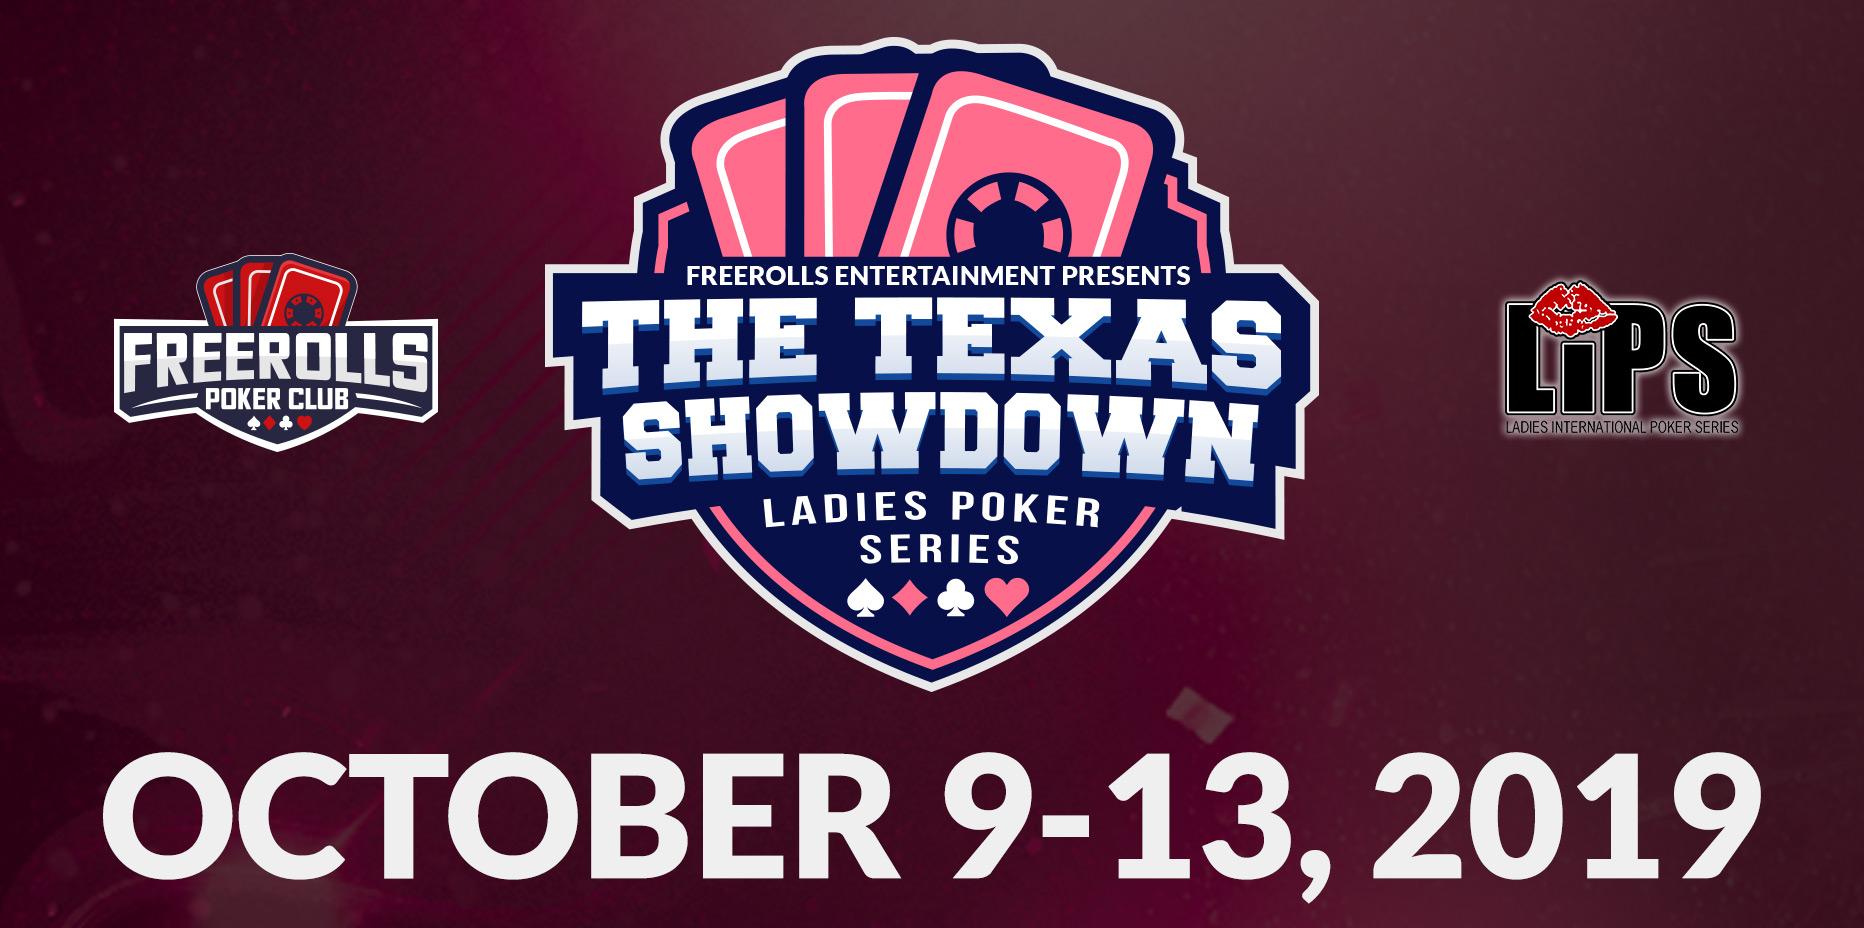 Texas Showdown at Freerolls